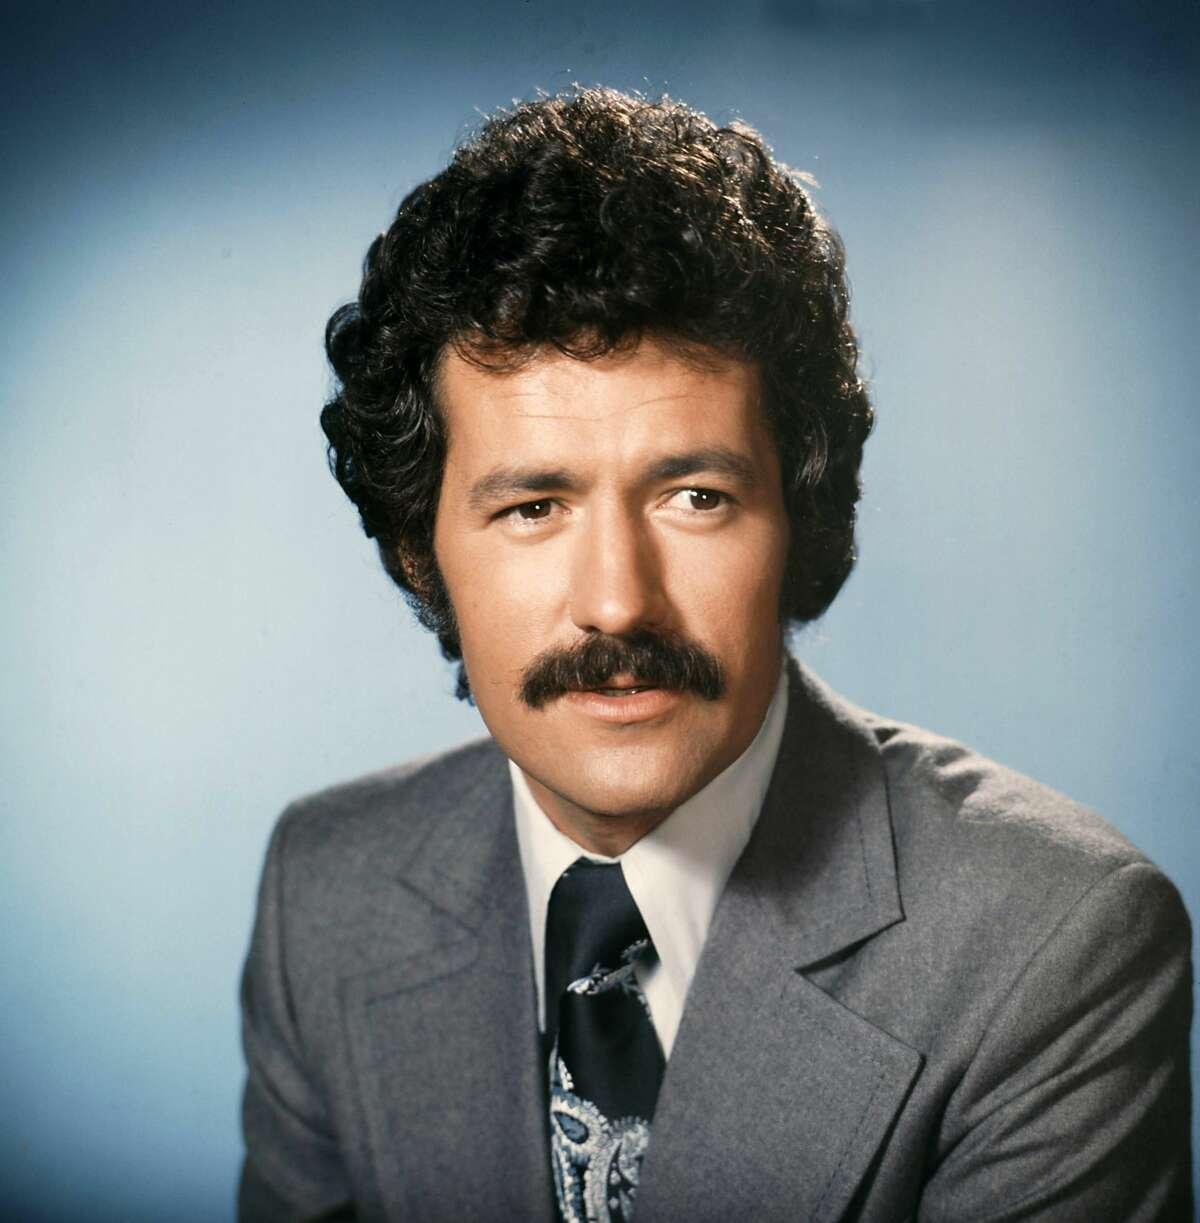 Alex Trebek, circa 1984. (Photo by Michael Ochs Archive/Getty Images)